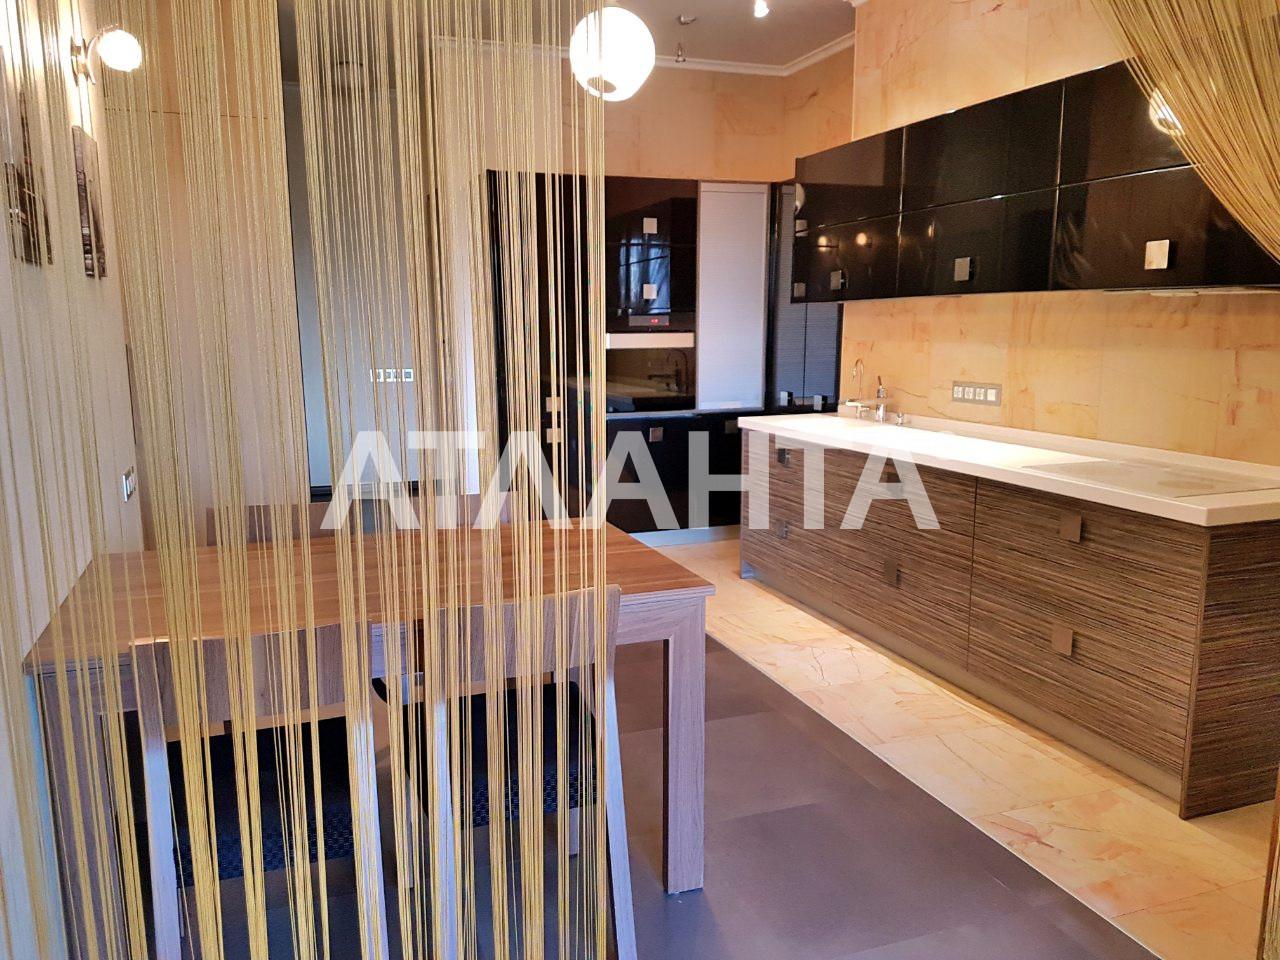 Продается 2-комнатная Квартира на ул. Шевченко Пр. — 96 000 у.е. (фото №10)